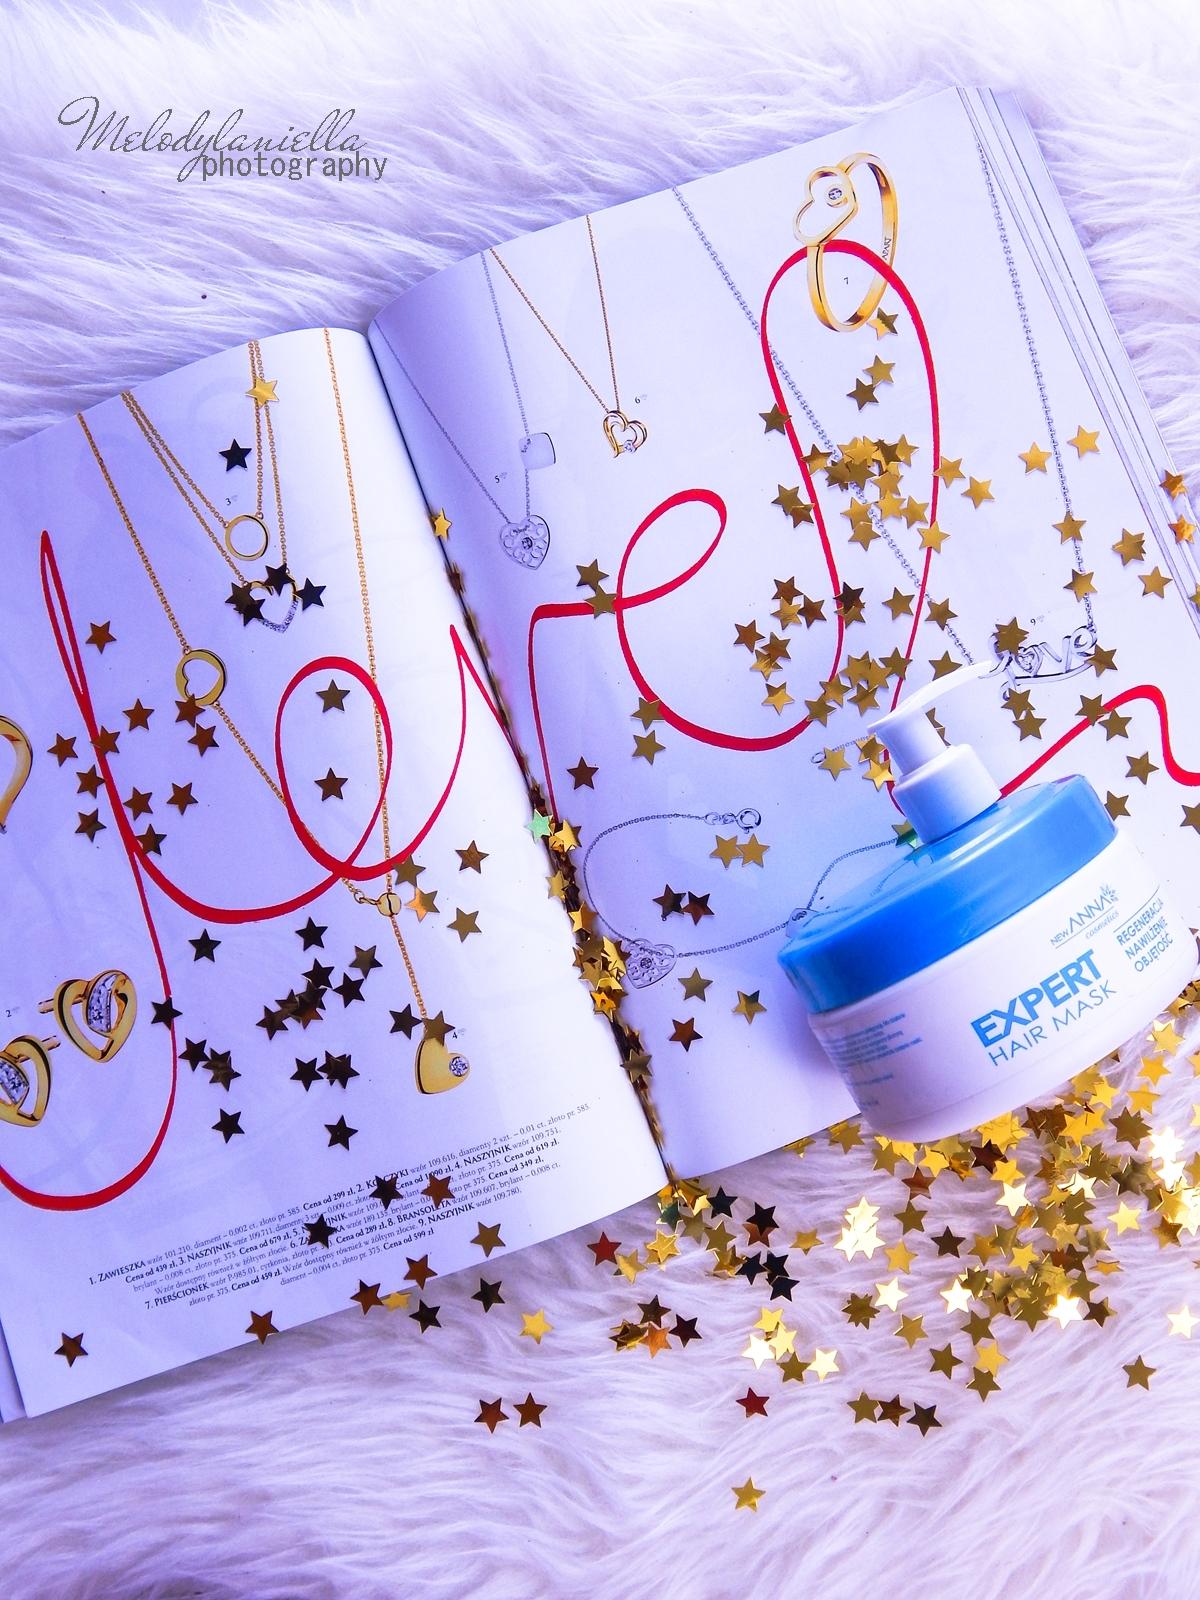 6 new anna cosmetics hair mask expert maska do włosów new anna cosmetics recenzje kosmetyków blog beauty lifestyle fashion melodylaniella love fotografia-2